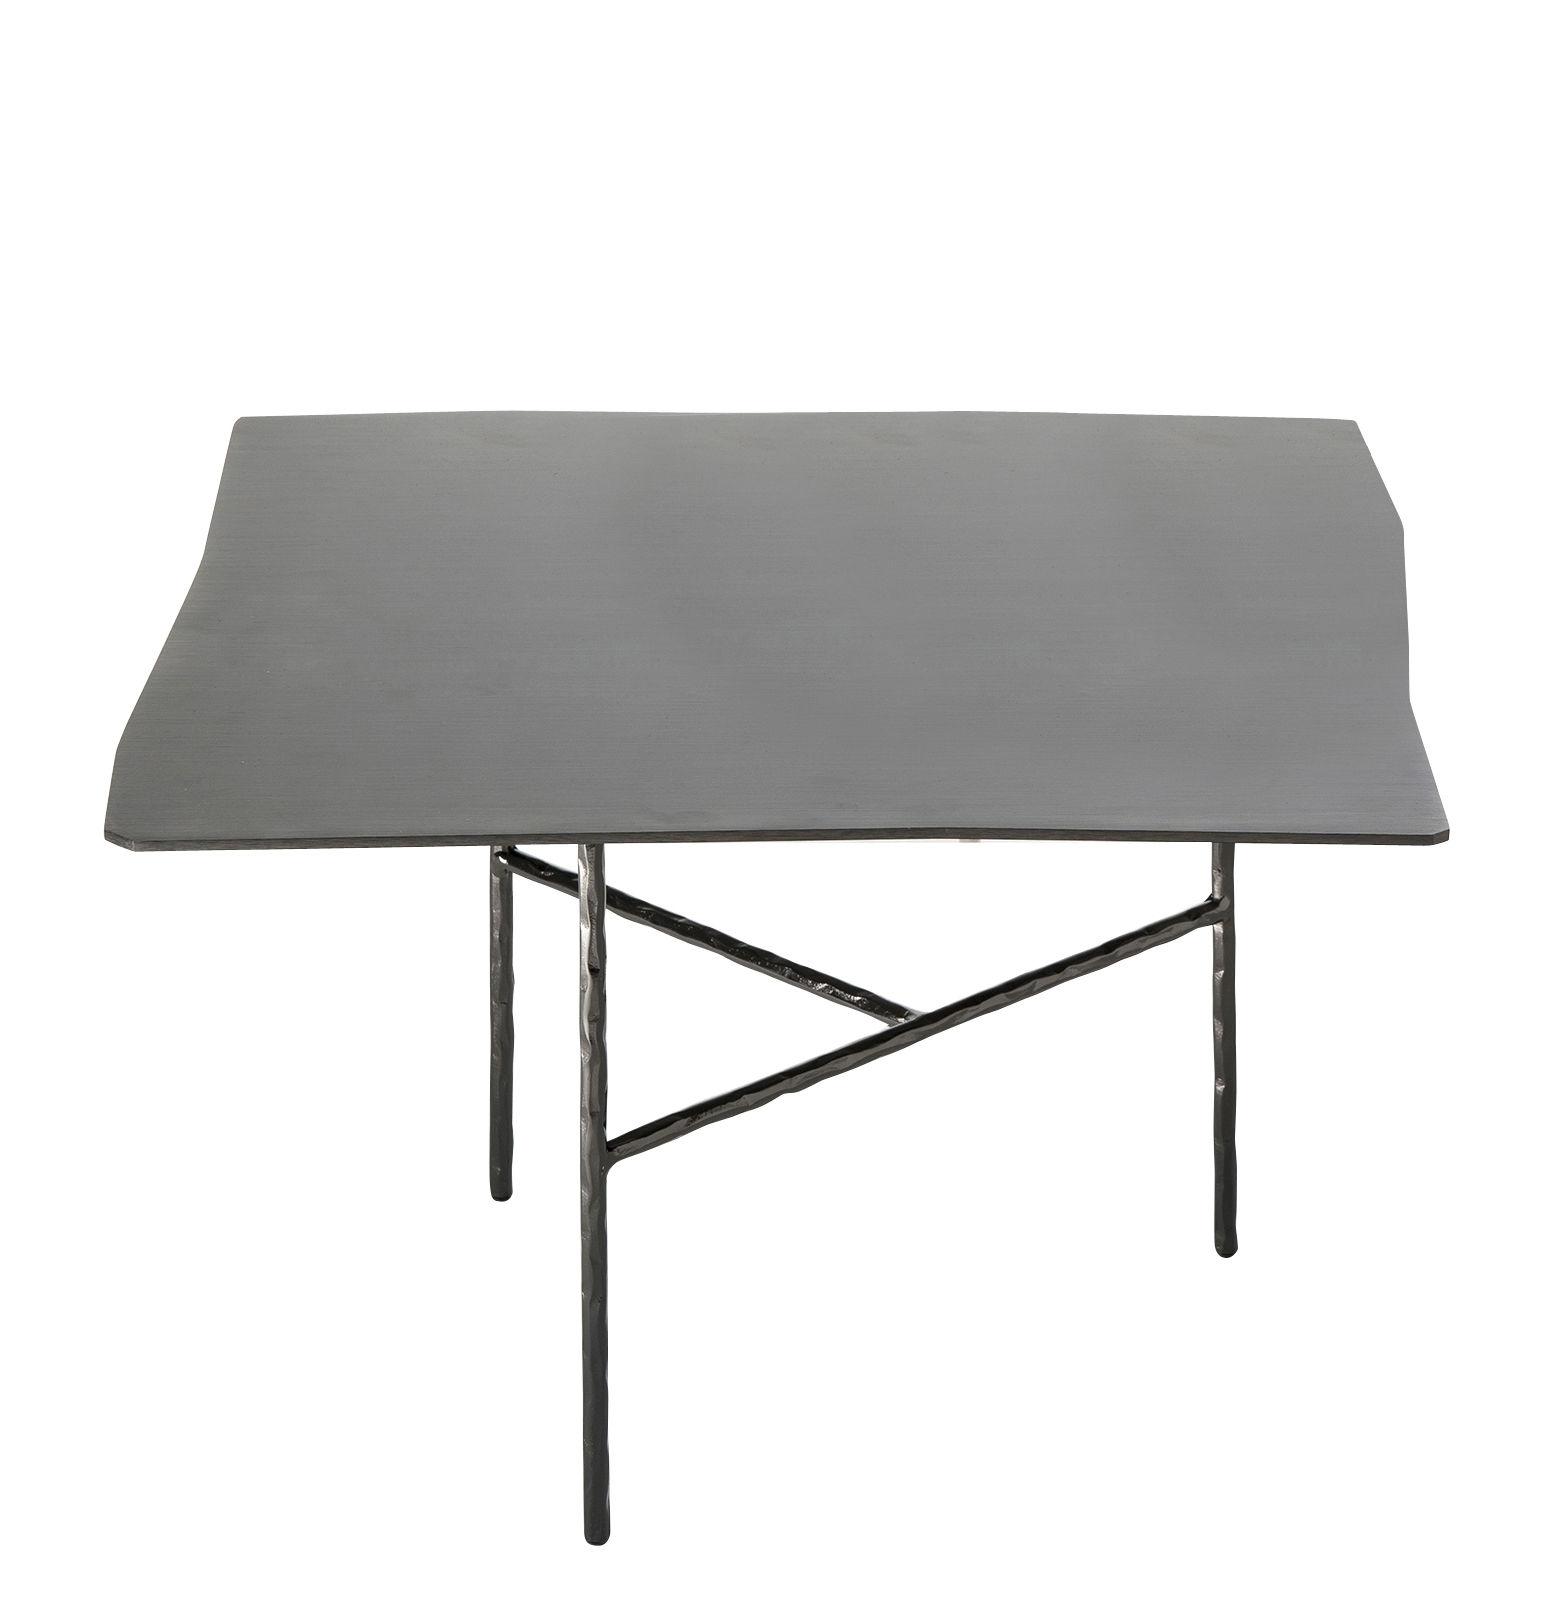 50 X 50 Square Coffee Table: / 52 X 50 X H 33 Cm Black By